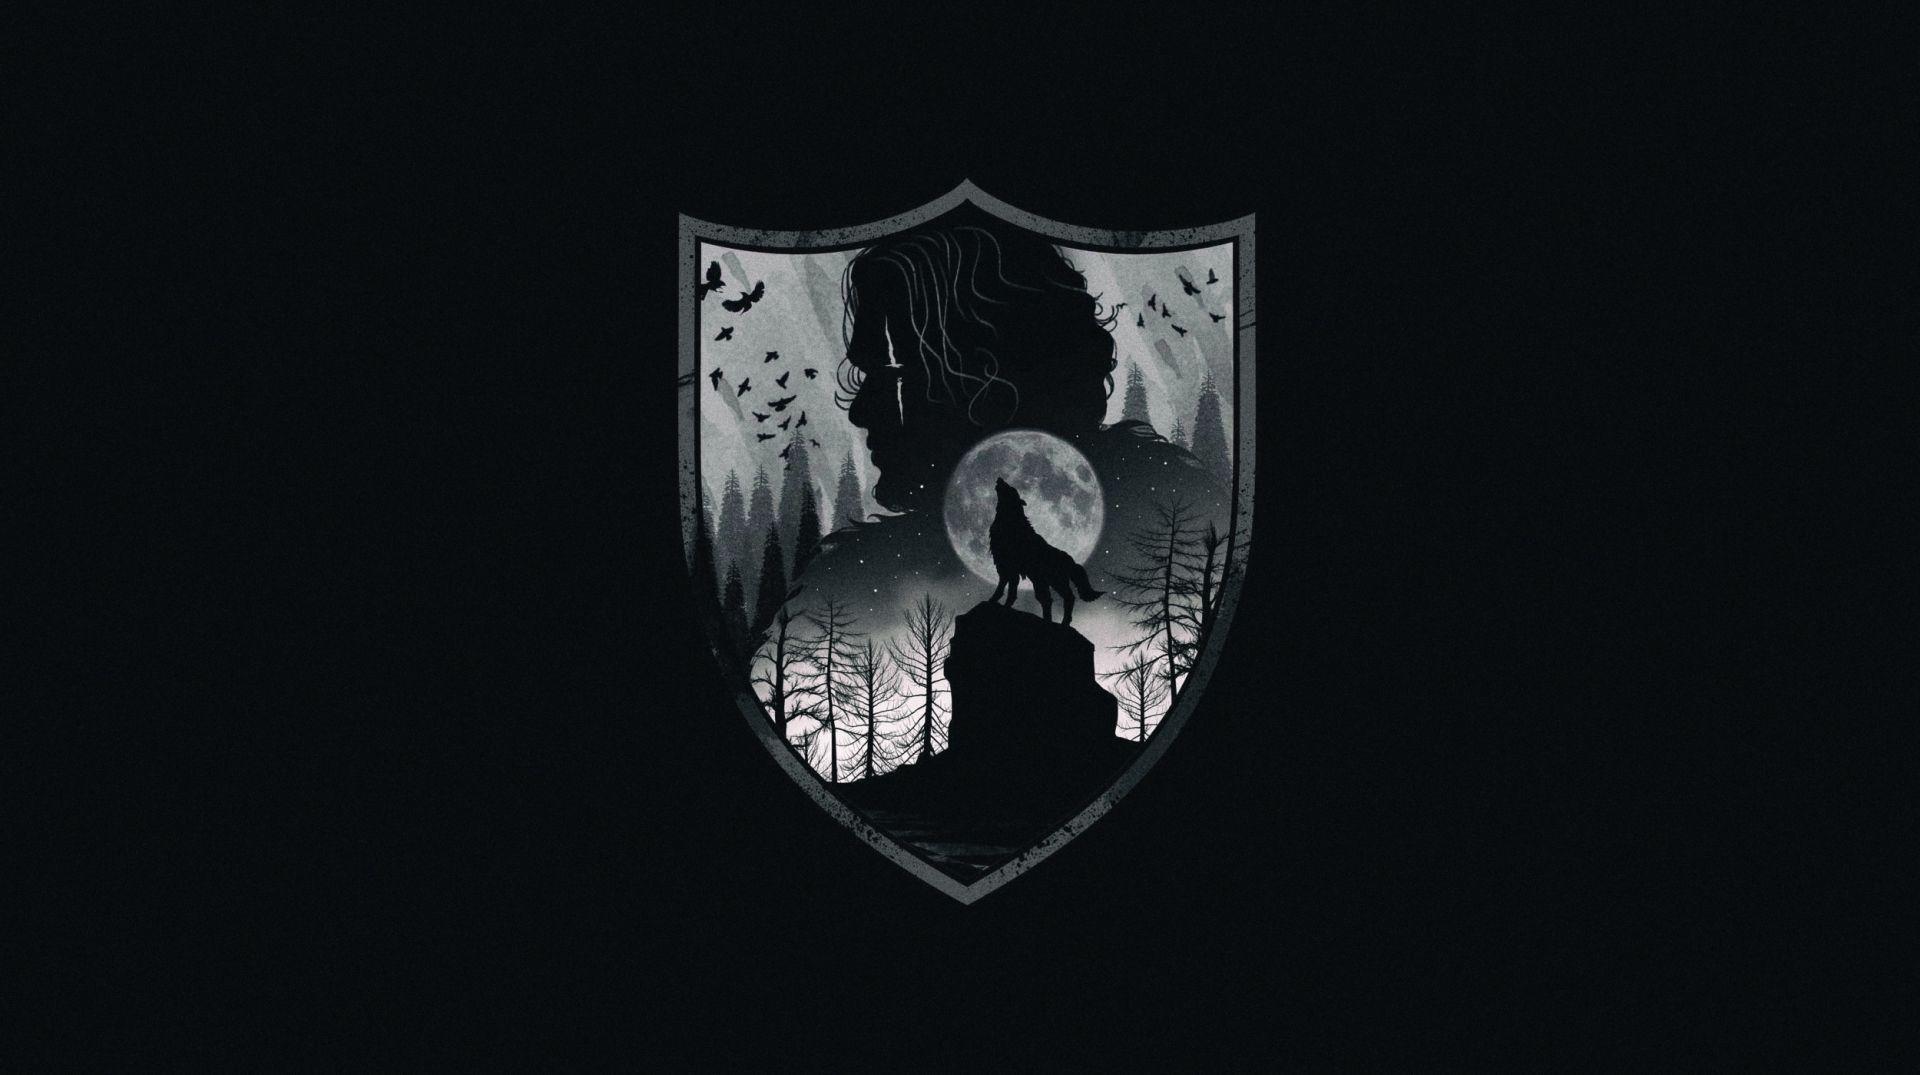 Game of Thrones shield illustration minimalist